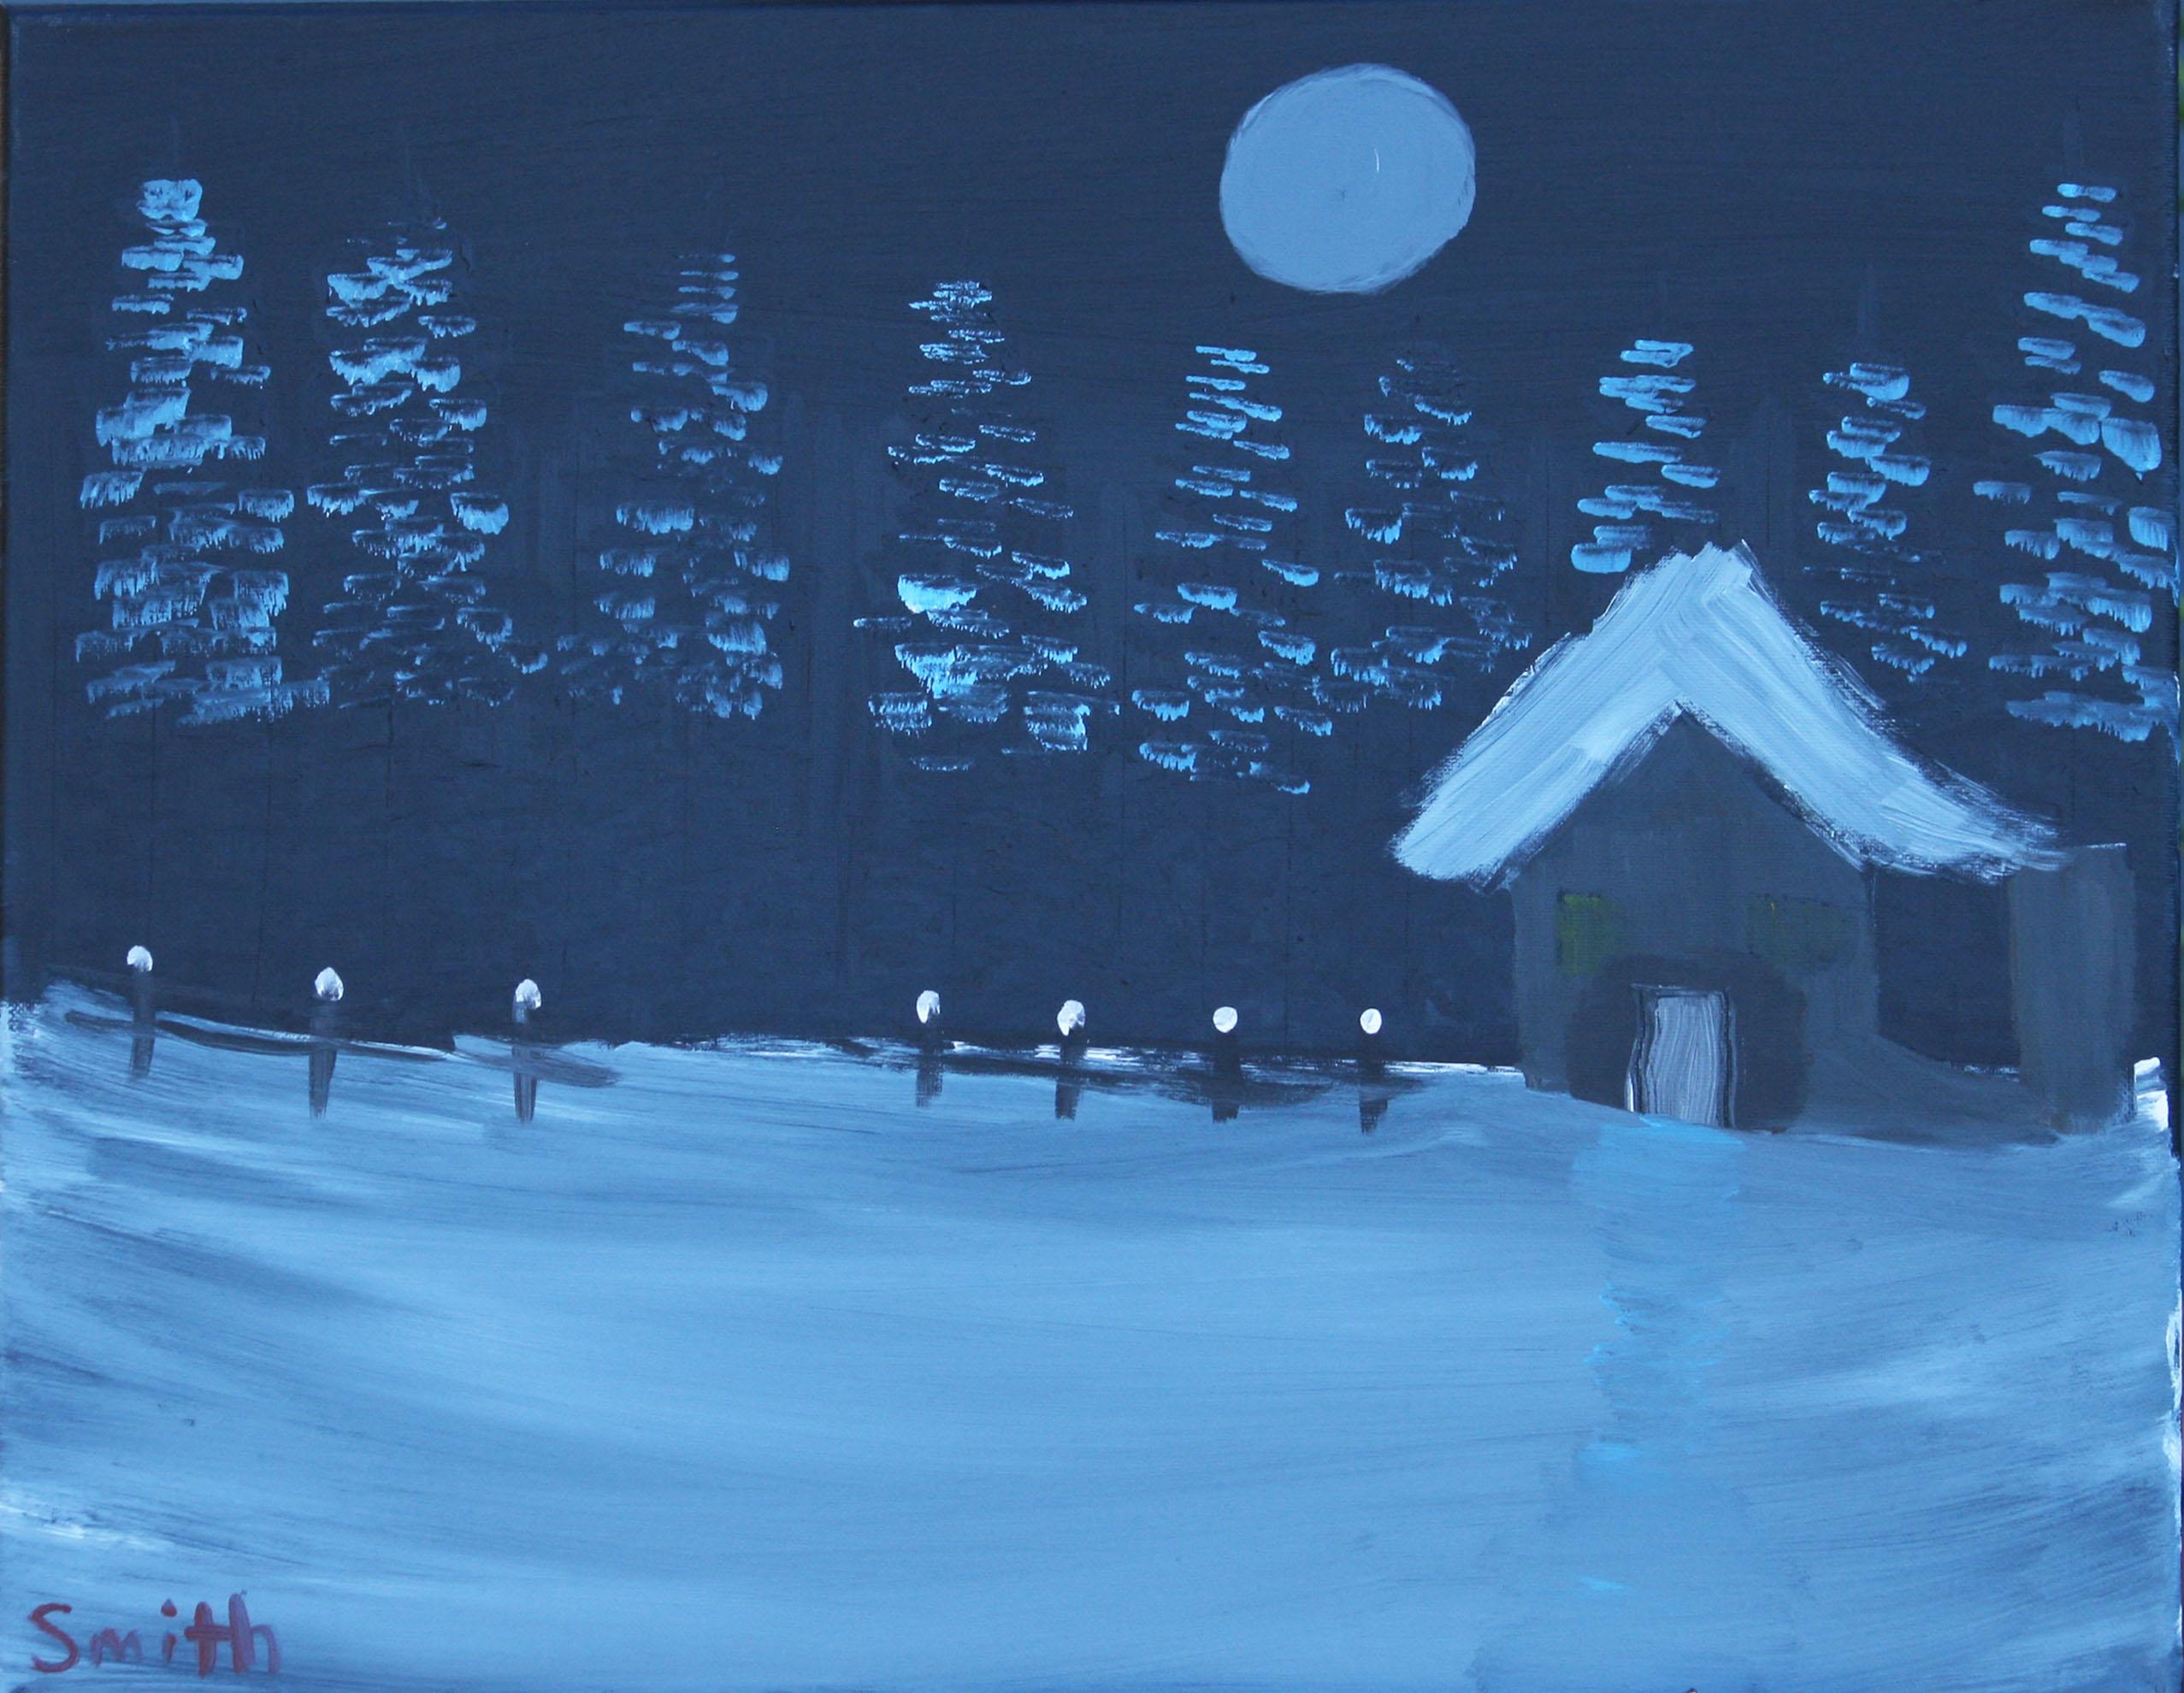 Nighttime-Winter-Cabin